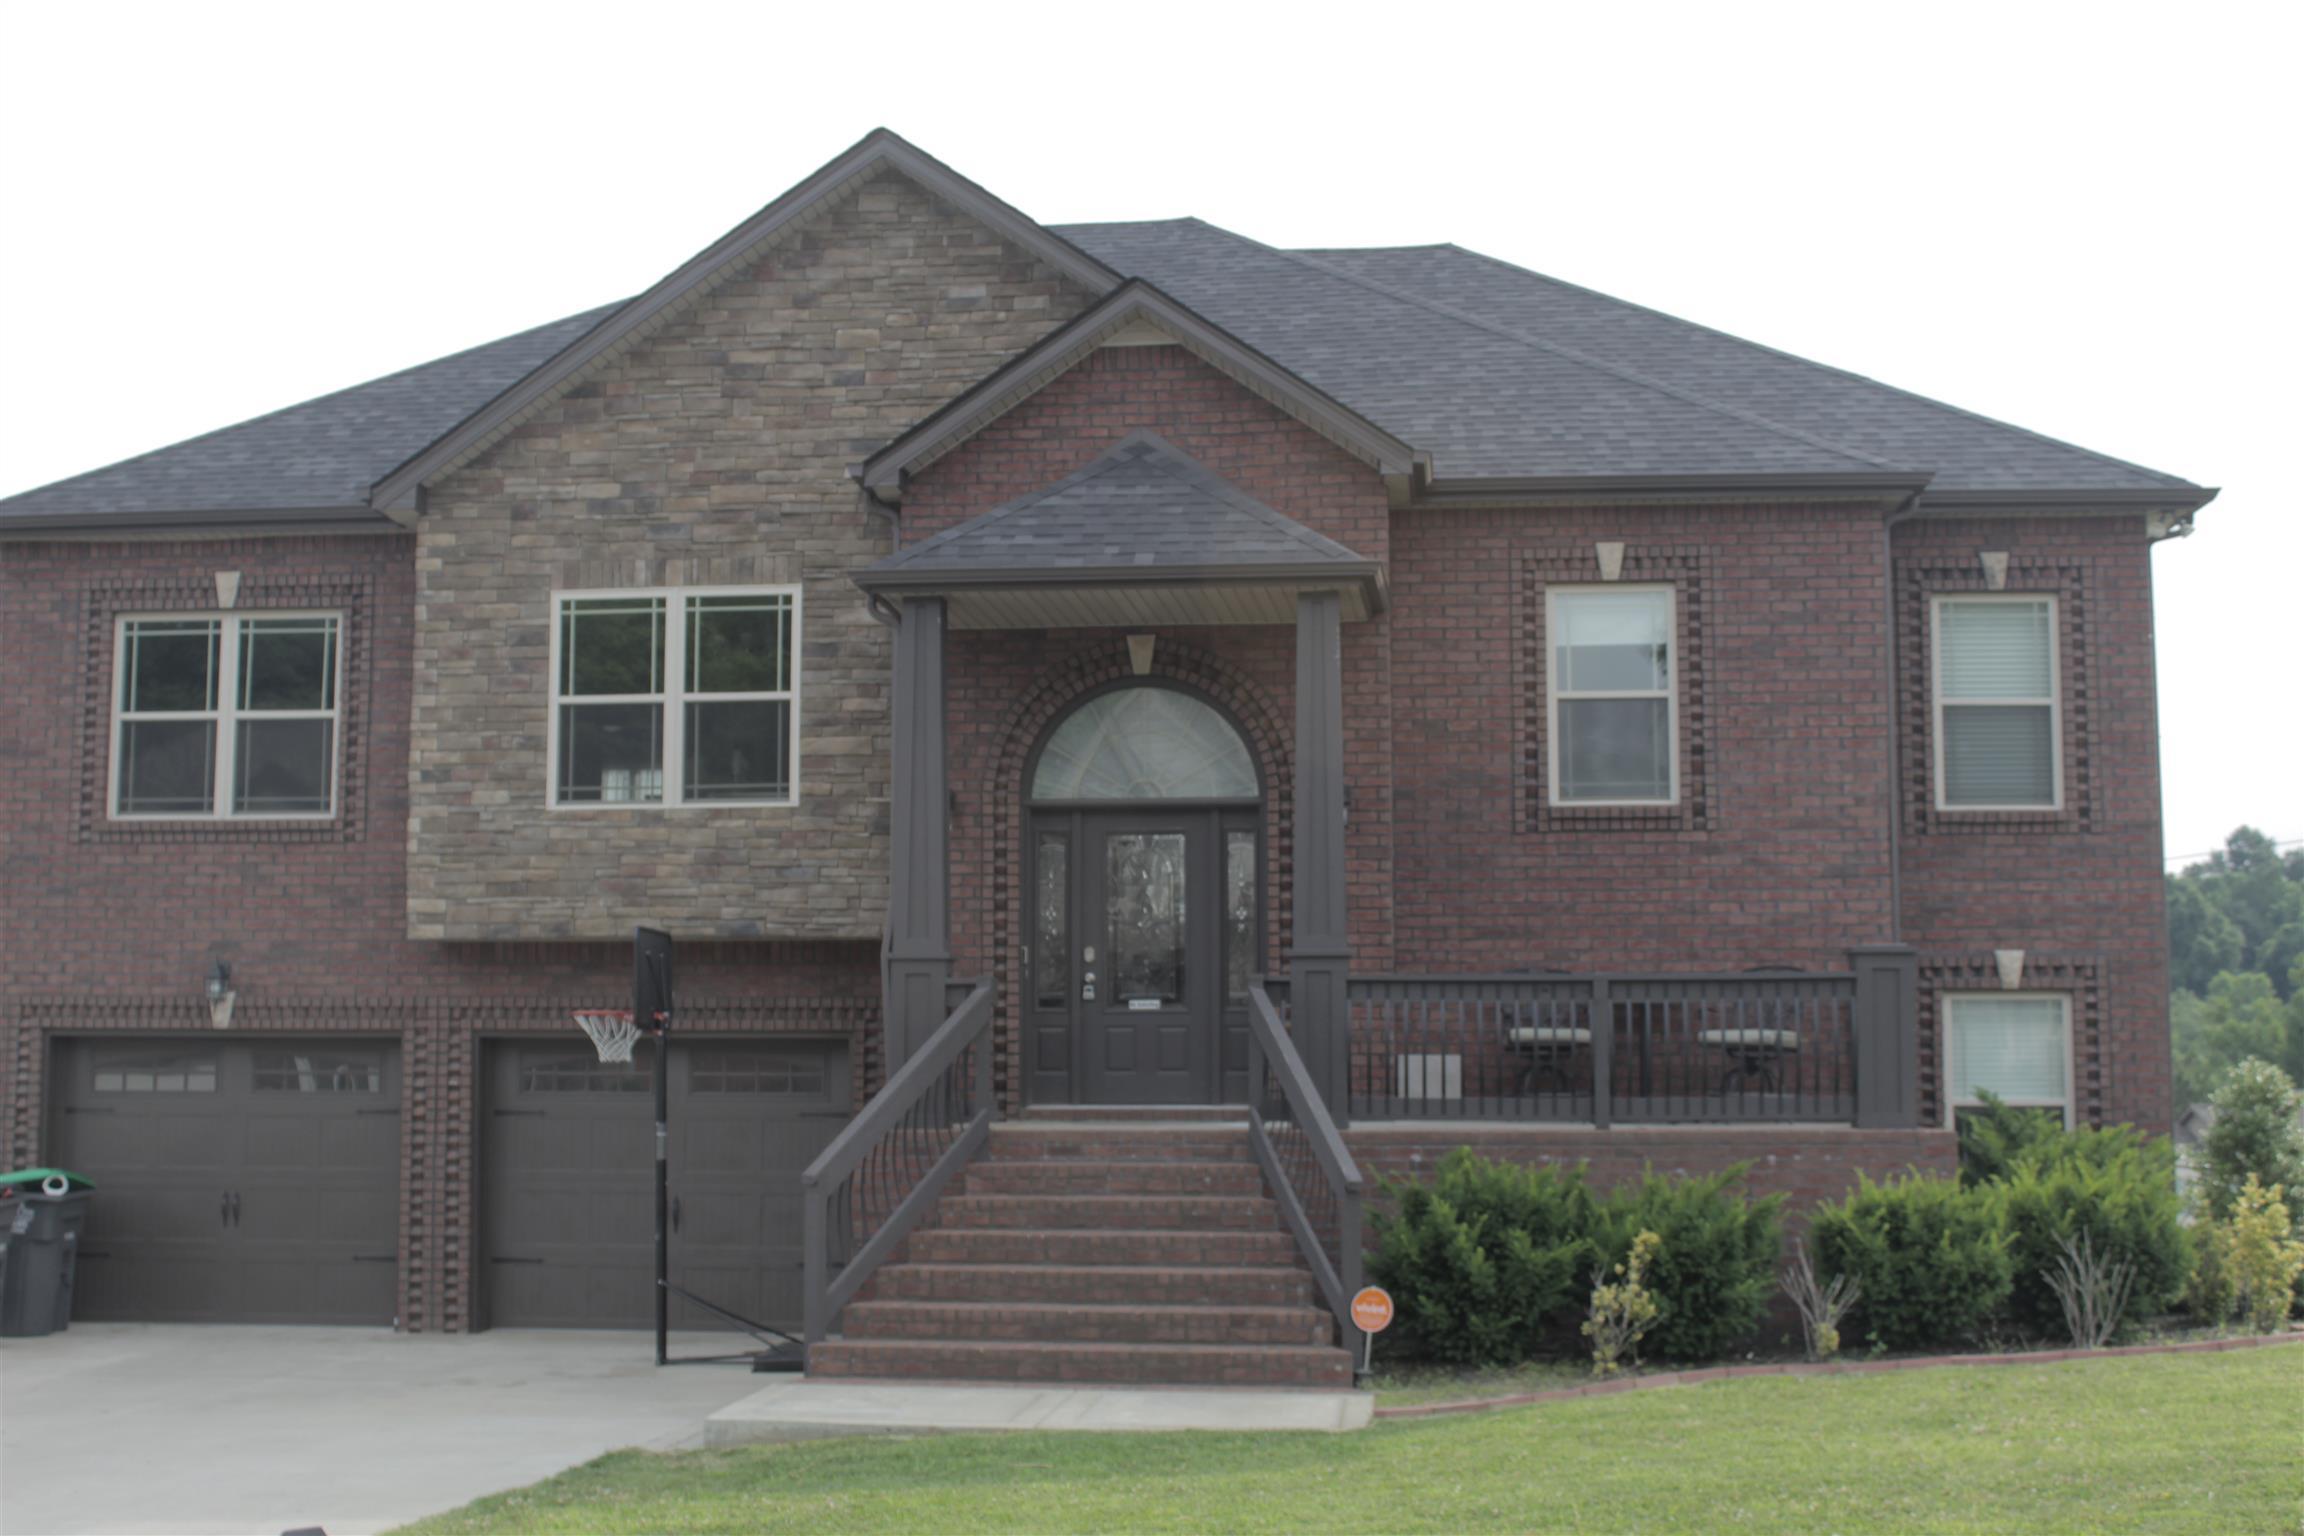 955 Smoots Dr, Clarksville, TN 37042 - Clarksville, TN real estate listing